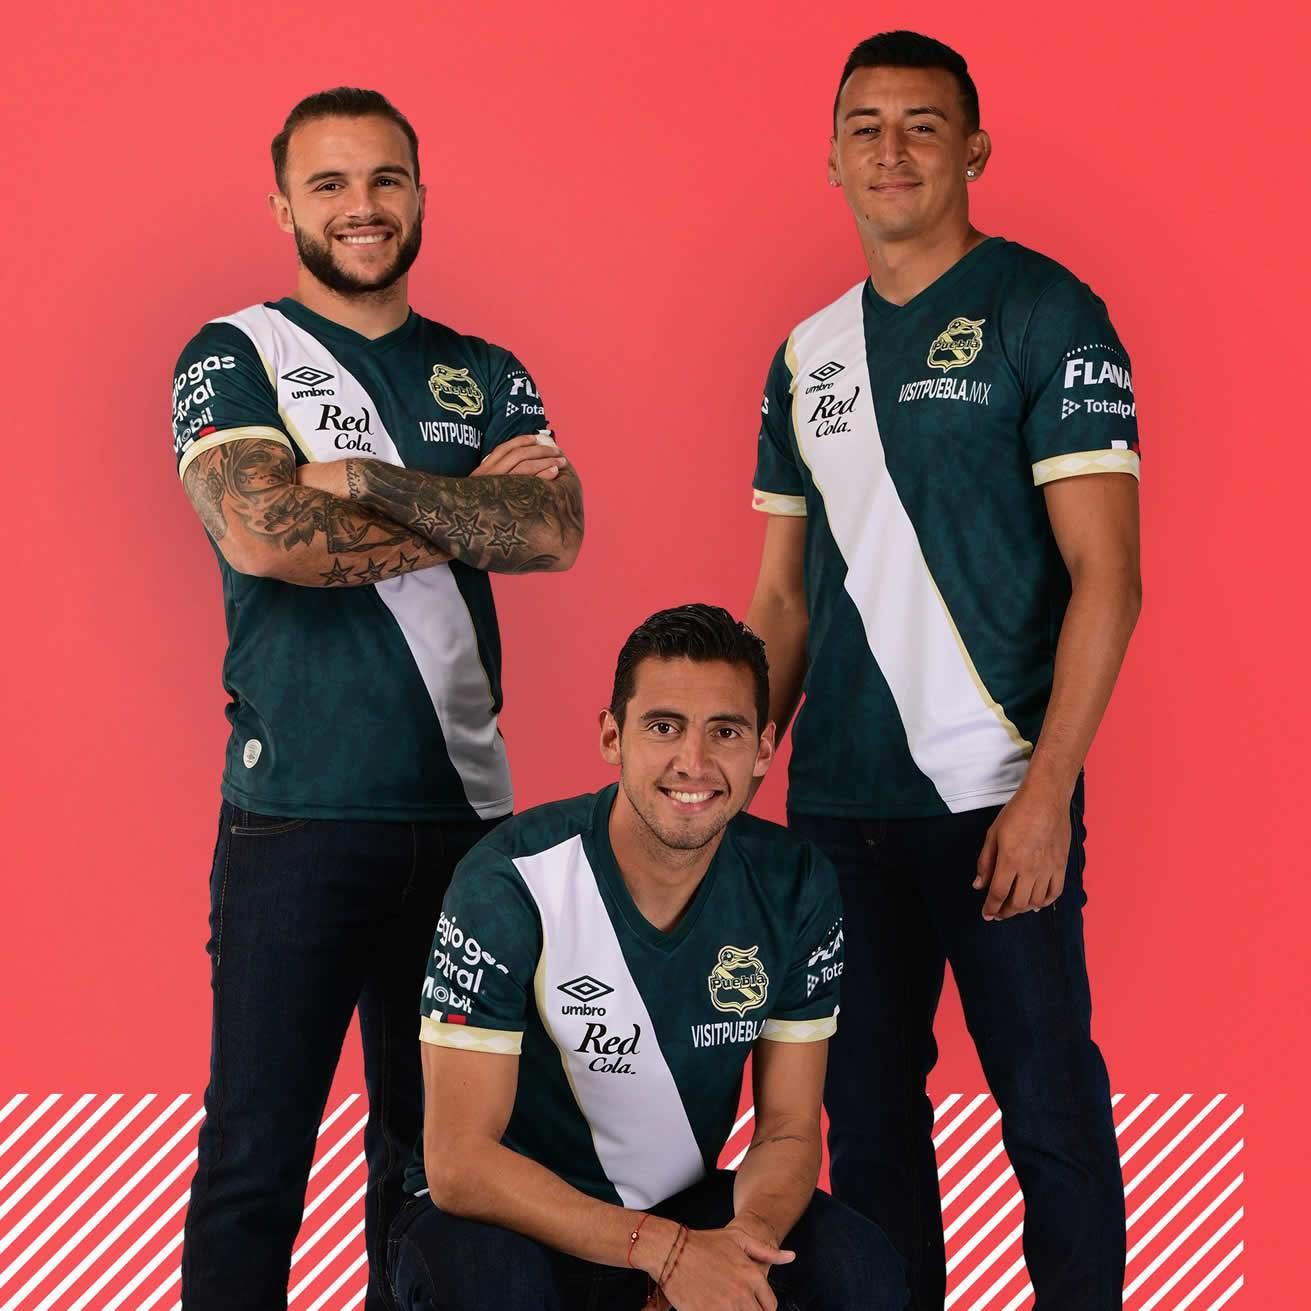 Camiseta visitante Umbro del Club Puebla 2021/22